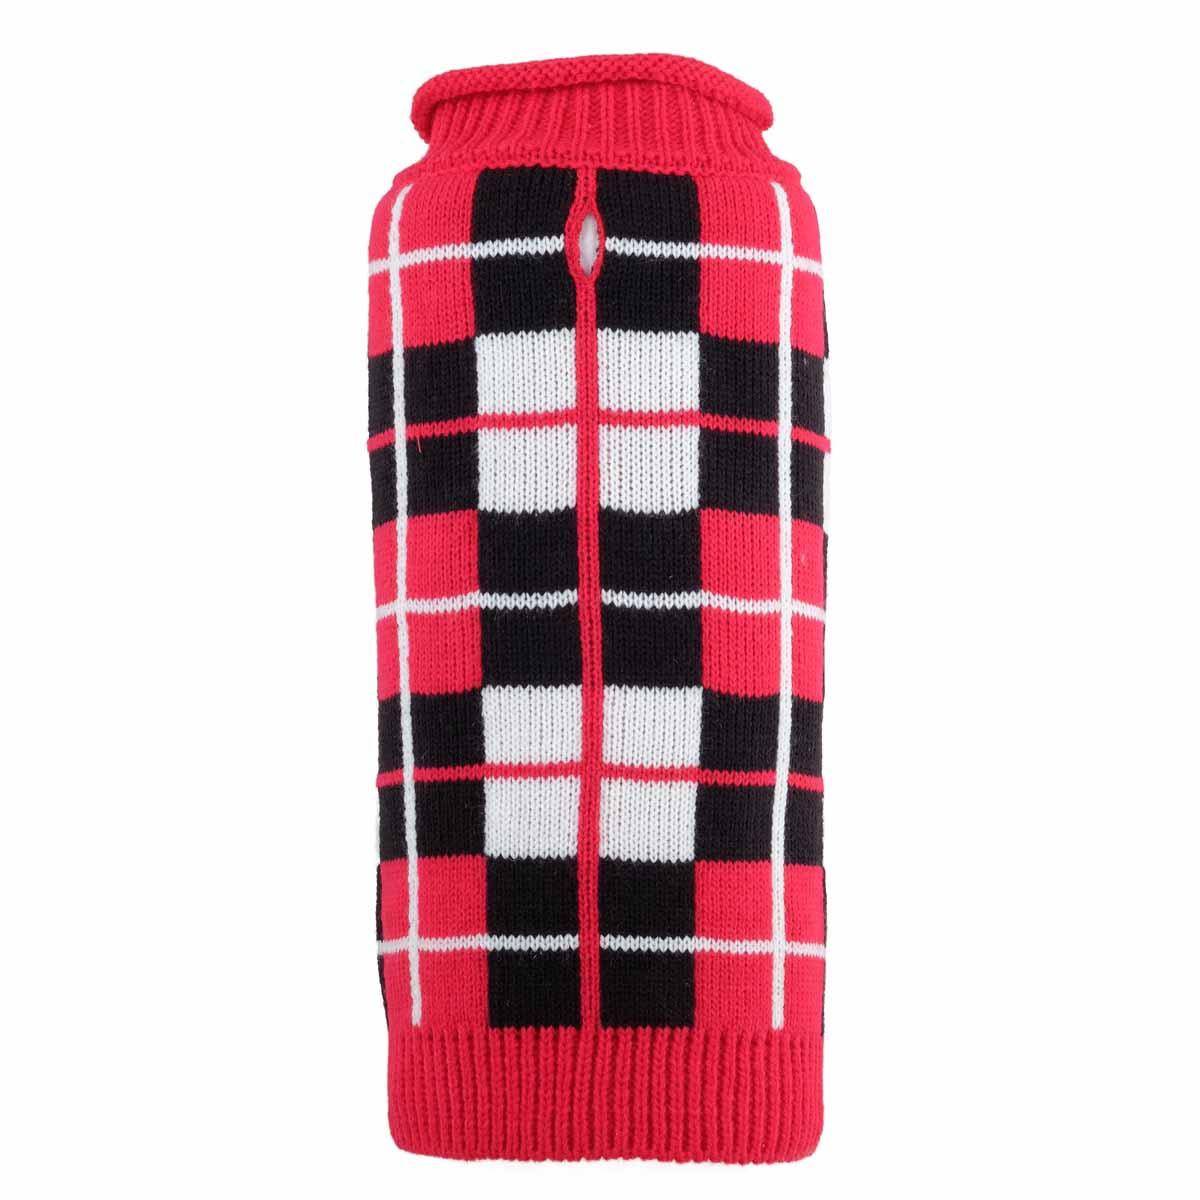 Worthy Dog Oxford Plaid Dog Sweater - Red